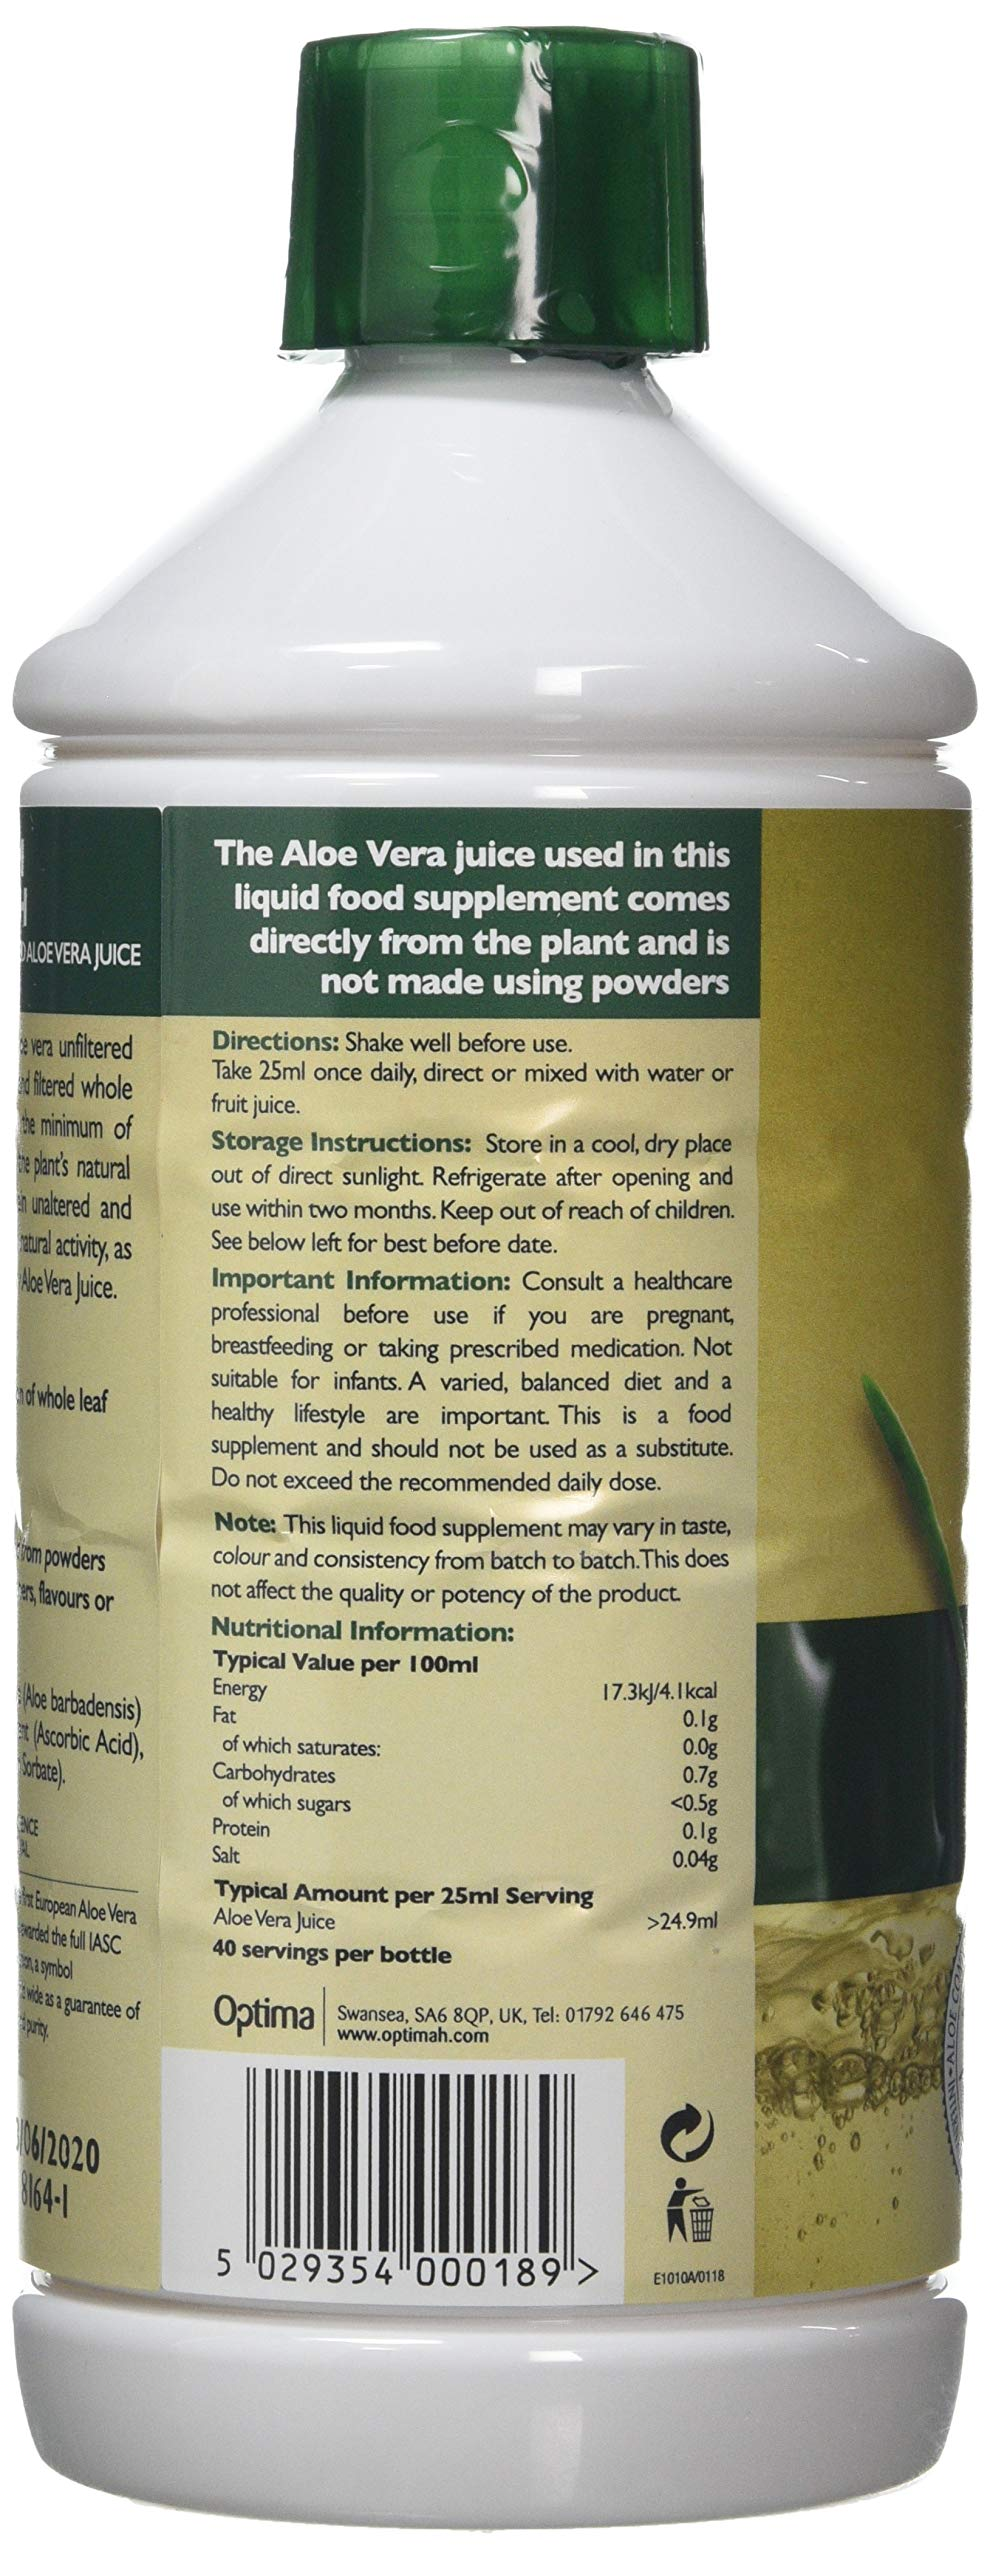 Aloe Pura Aloe Vera Juice Max Strength, 1L 4